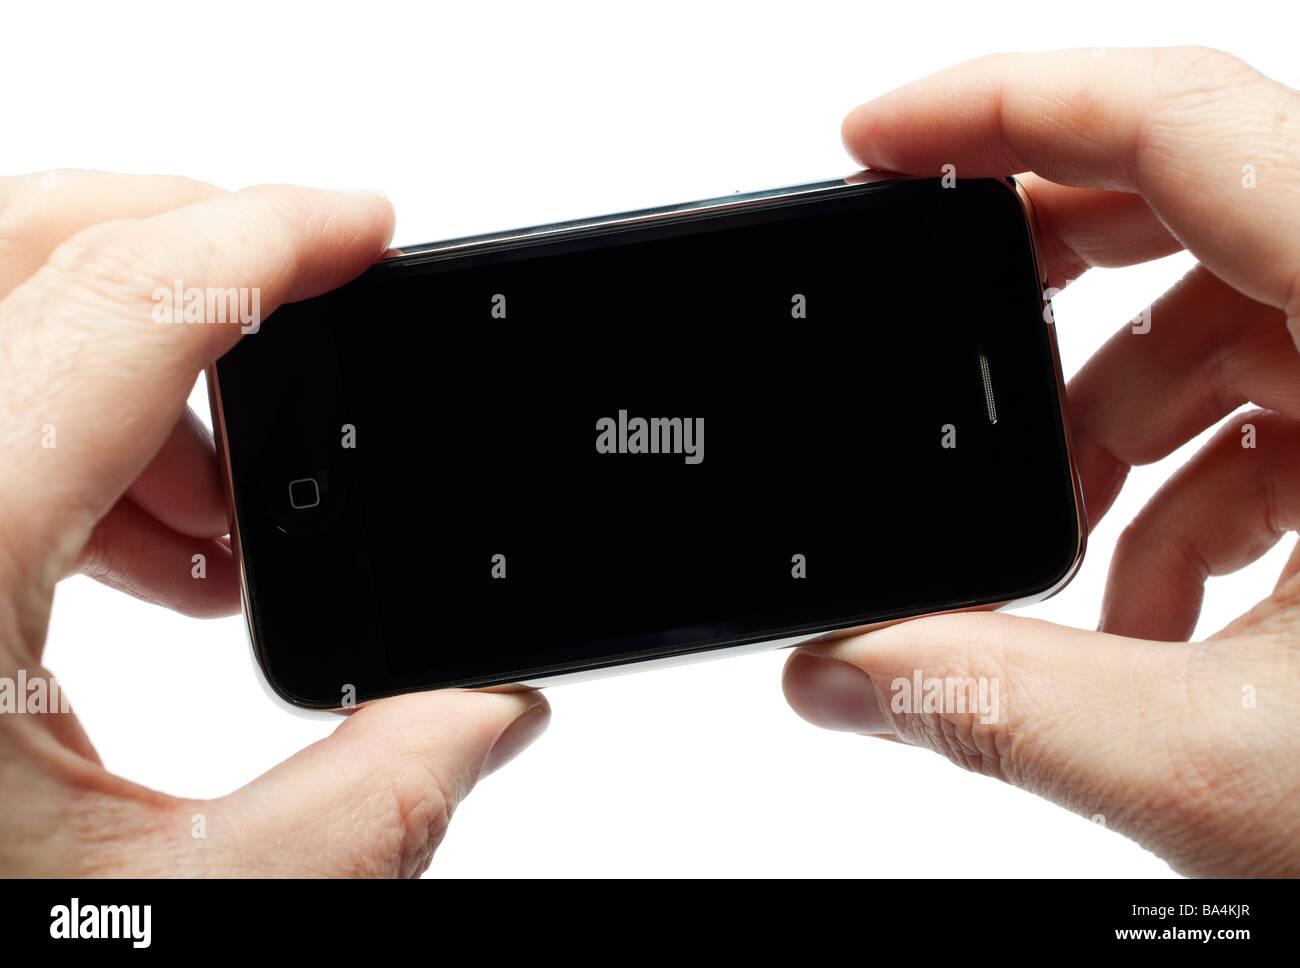 Maschio di mani tenendo iPhone mostra una schermata vuota Immagini Stock